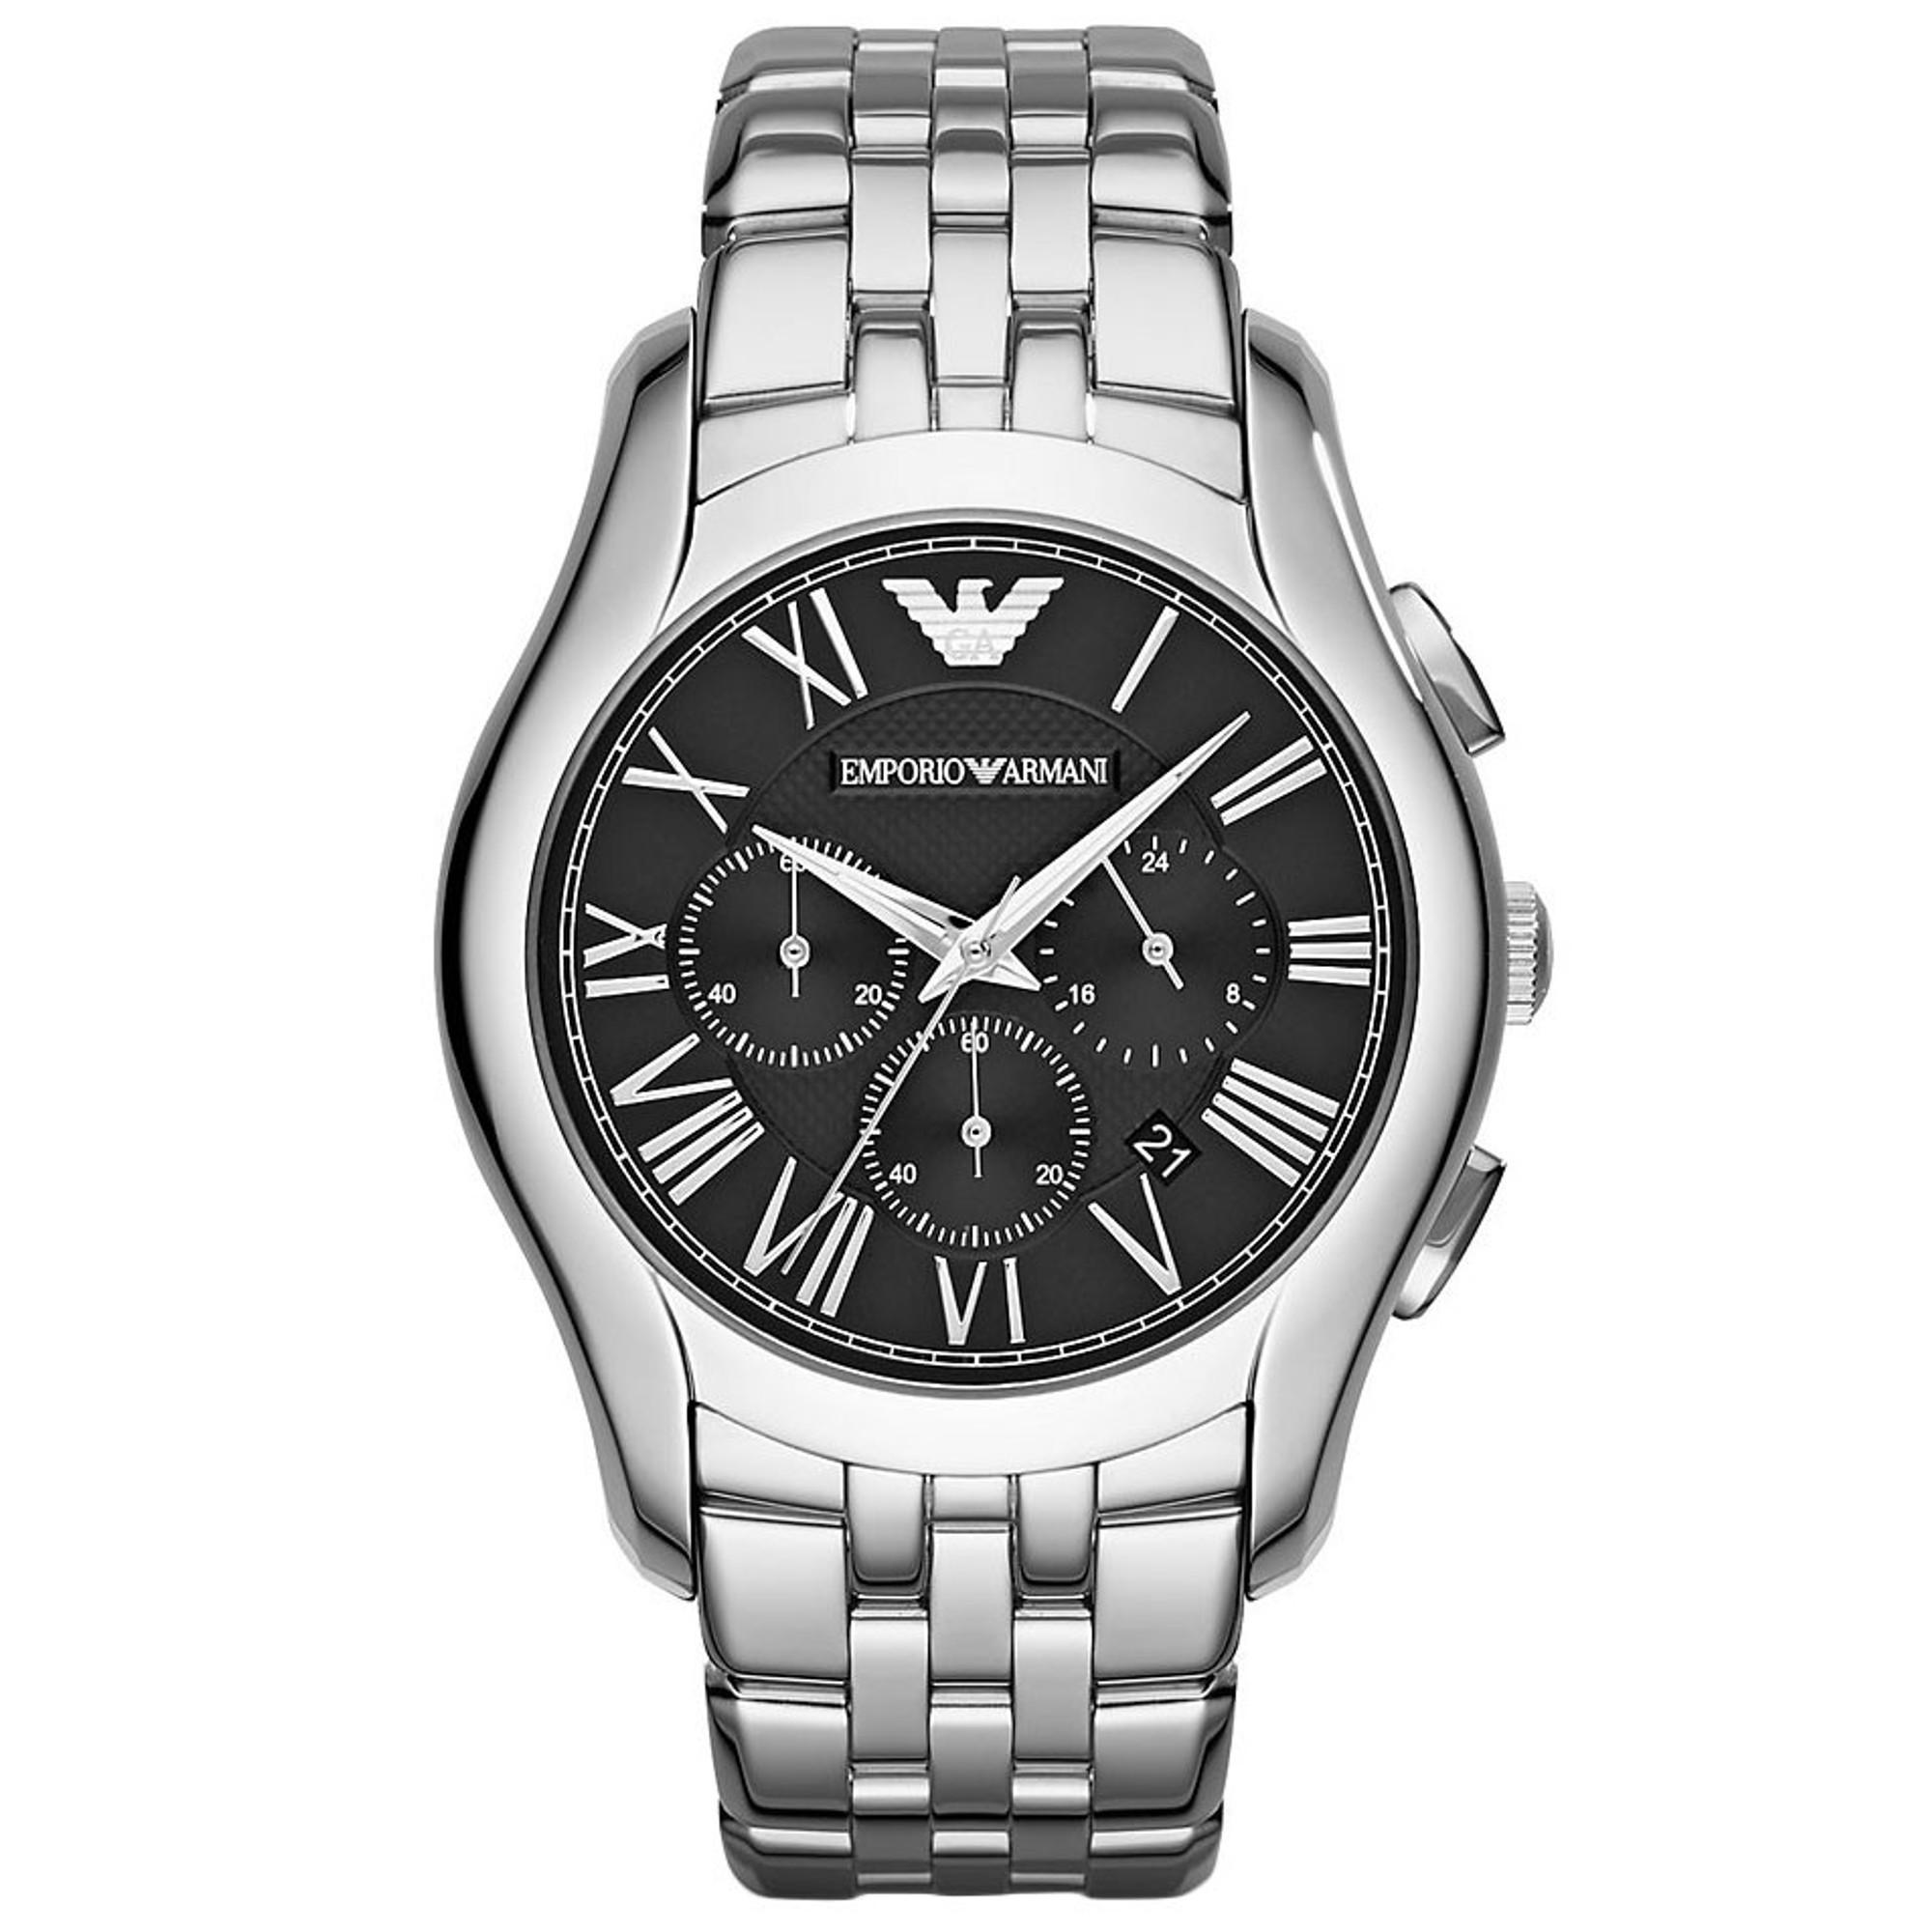 EMPORIO ARMANI Classic Watch Chronograph AR1786